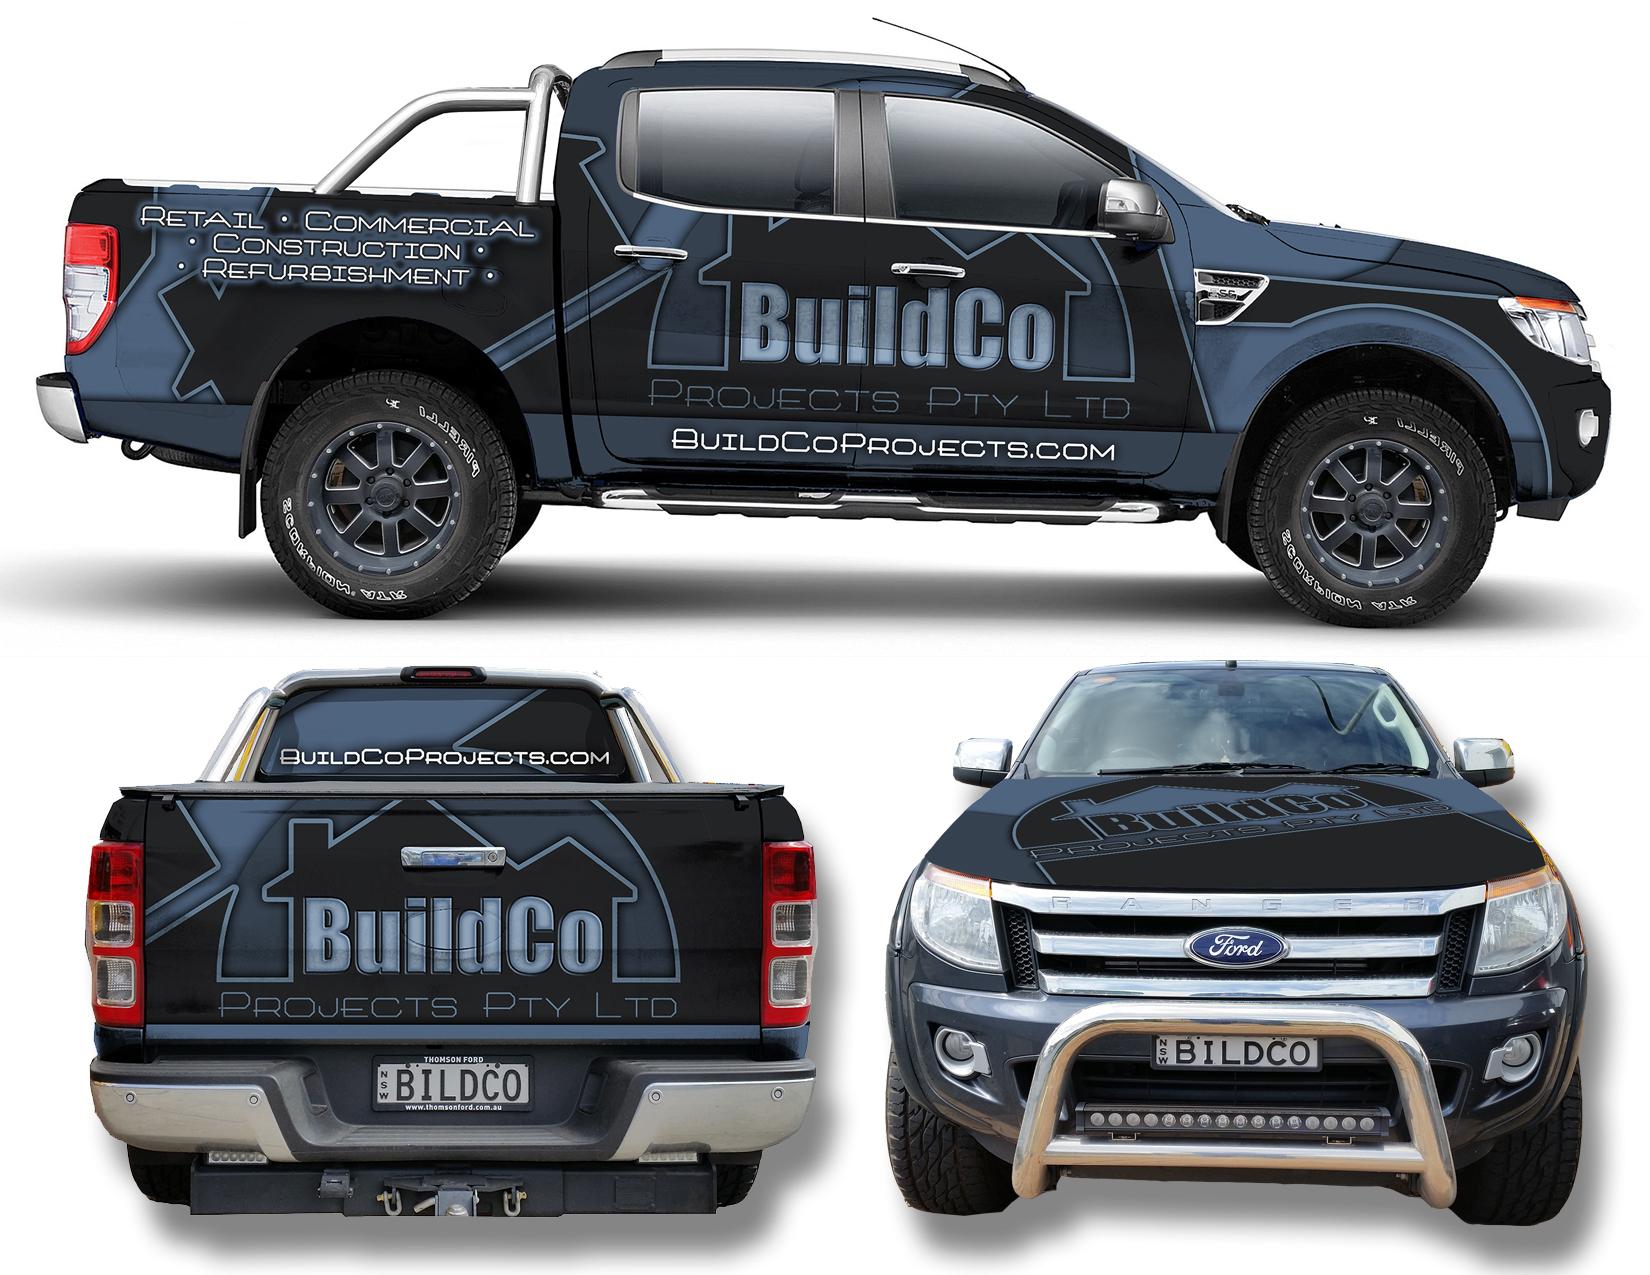 Viva car sticker design - Bold Car Wrap For Construction Company